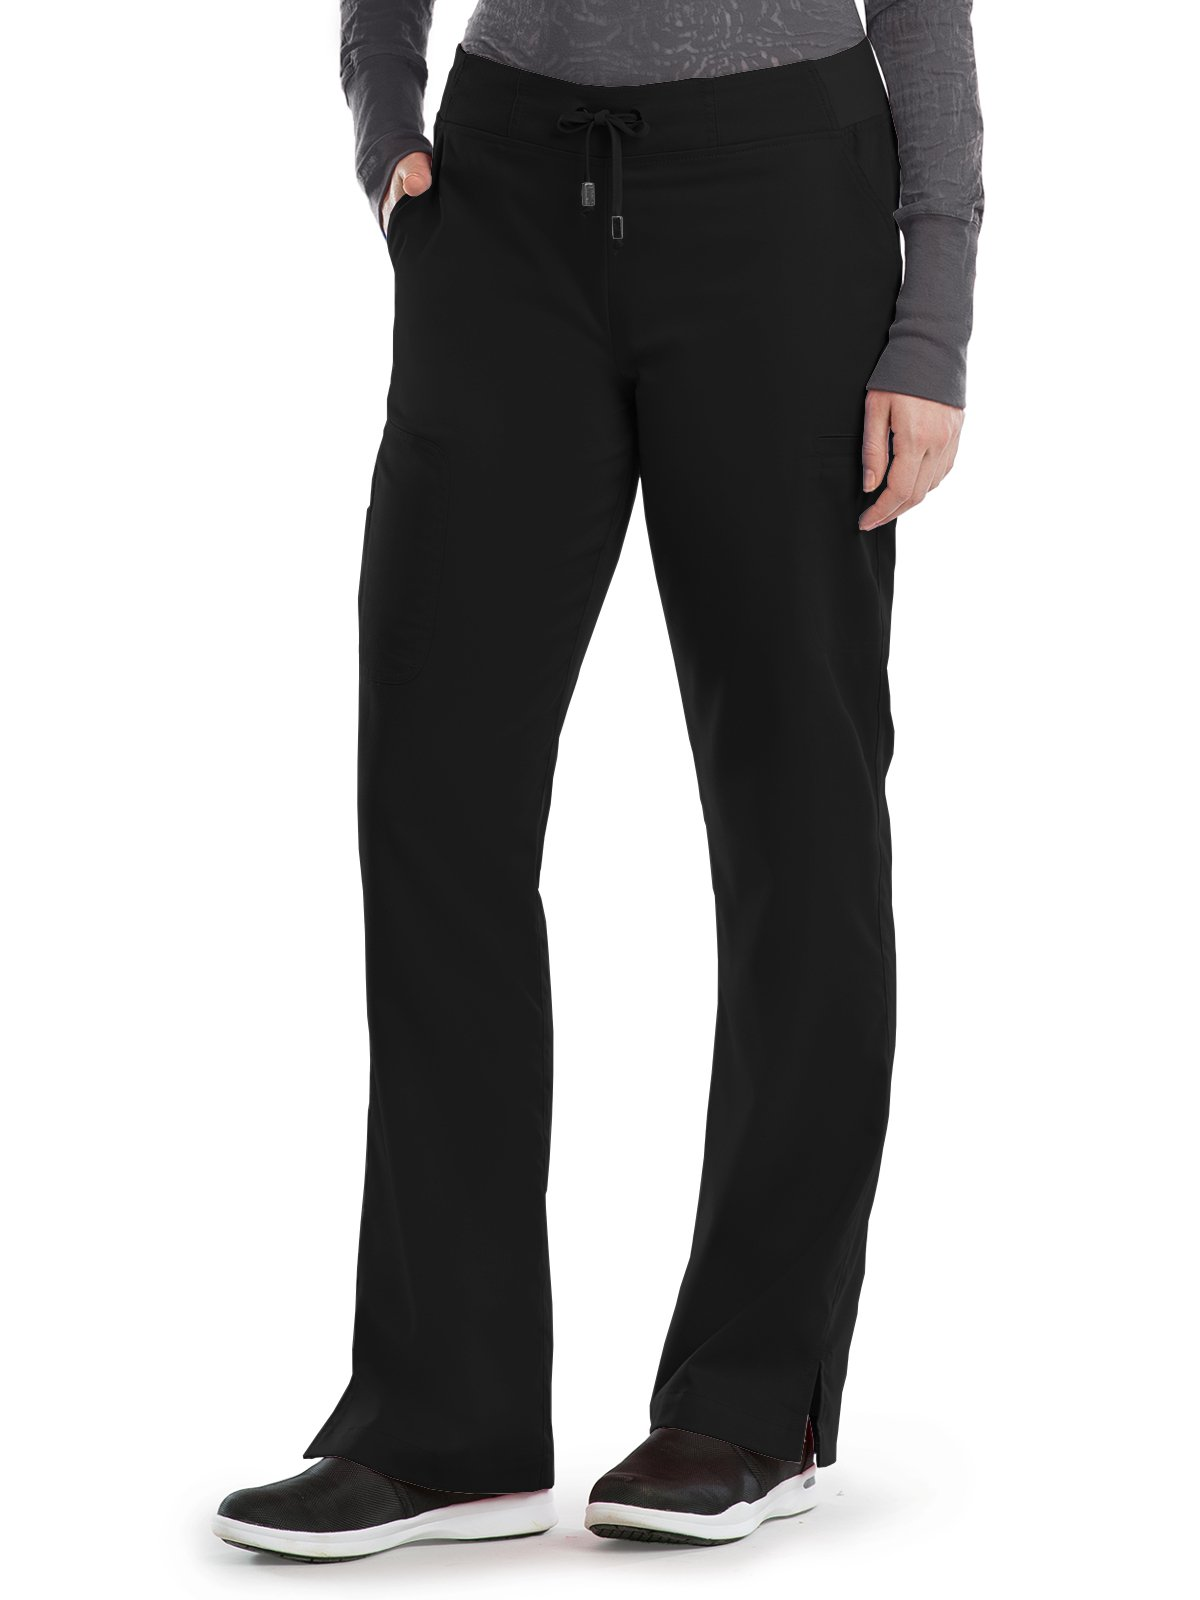 Grey's Anatomy 4277 Straight Leg Pant Black XS Petite